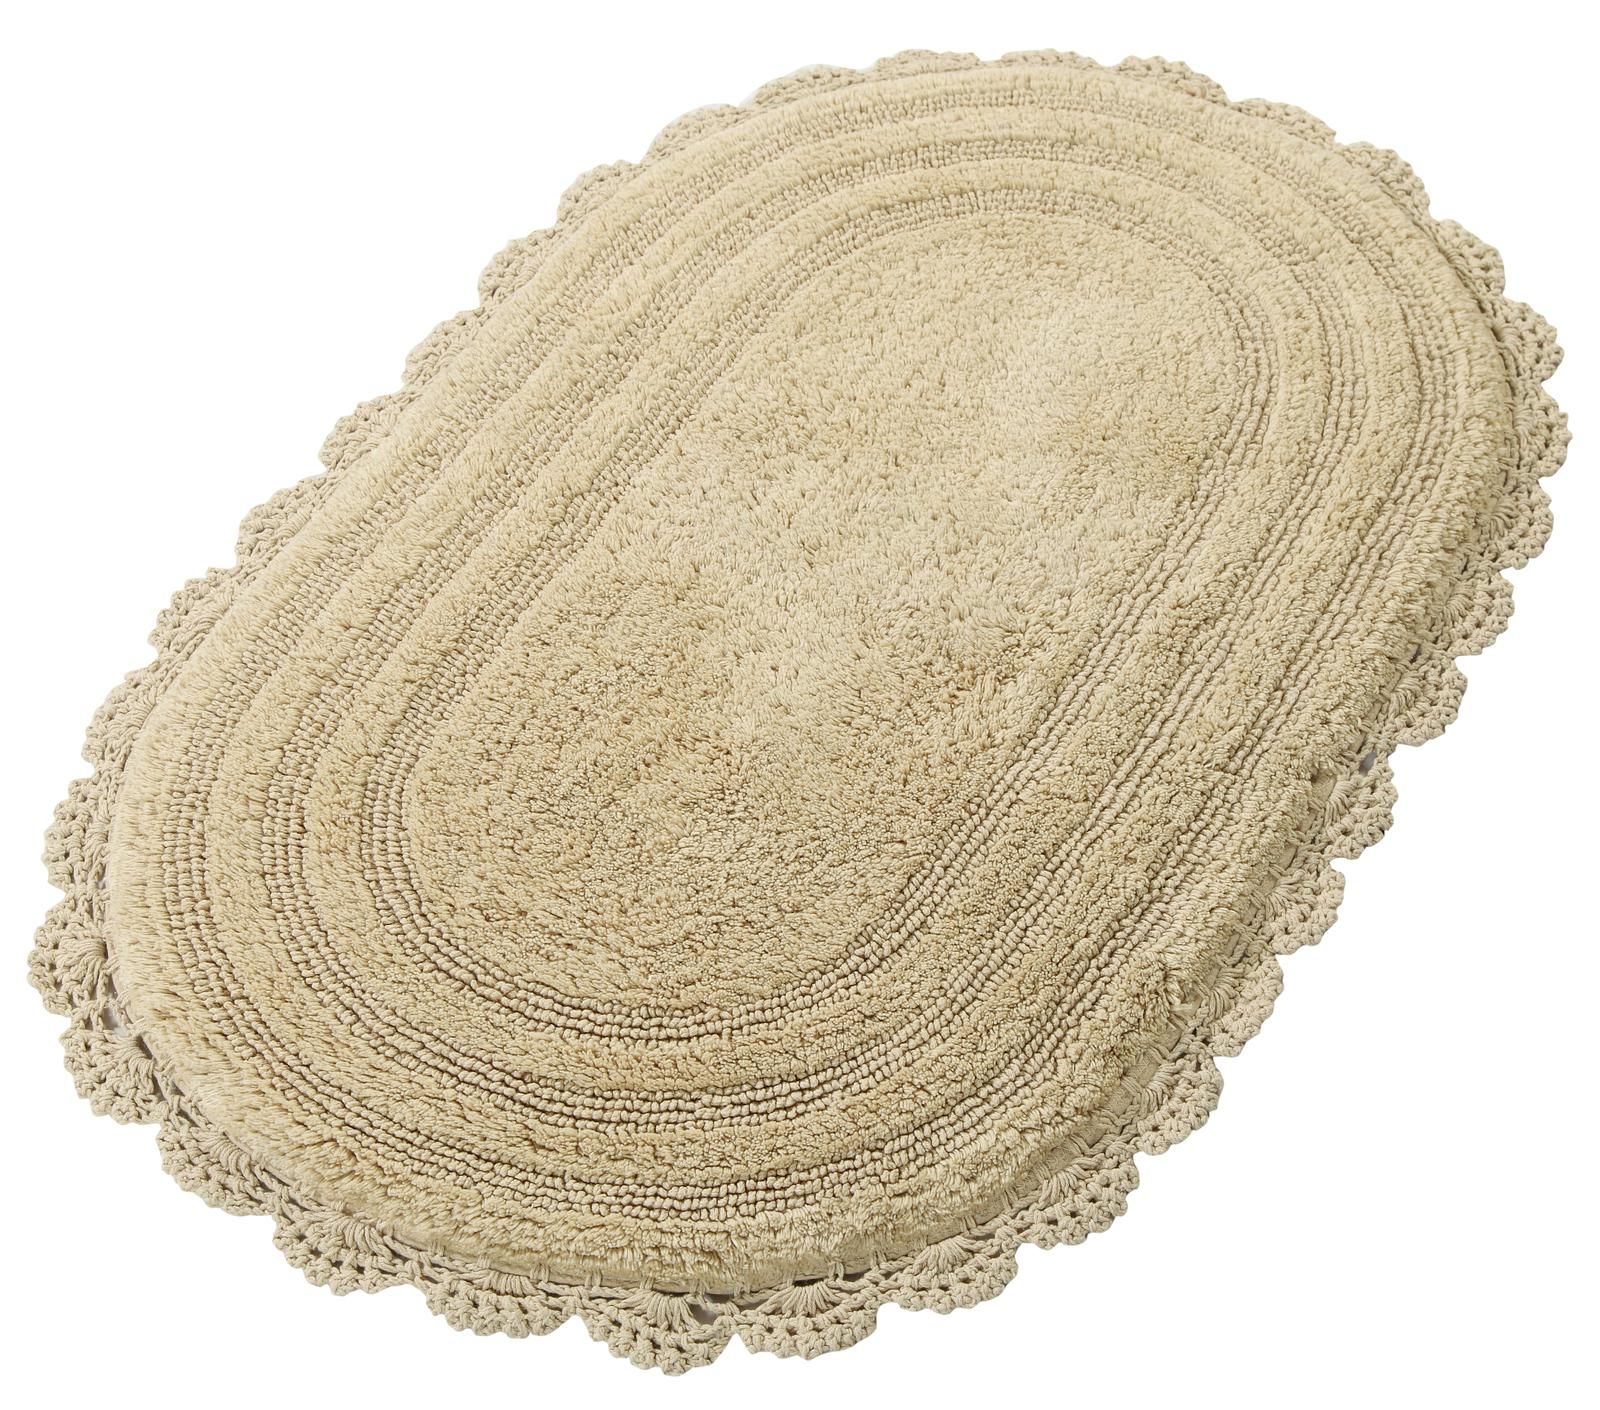 Reversible 100% Long Staple Cotton Yarn Hand Crochet, & Tufted 21*34 Bath Rug